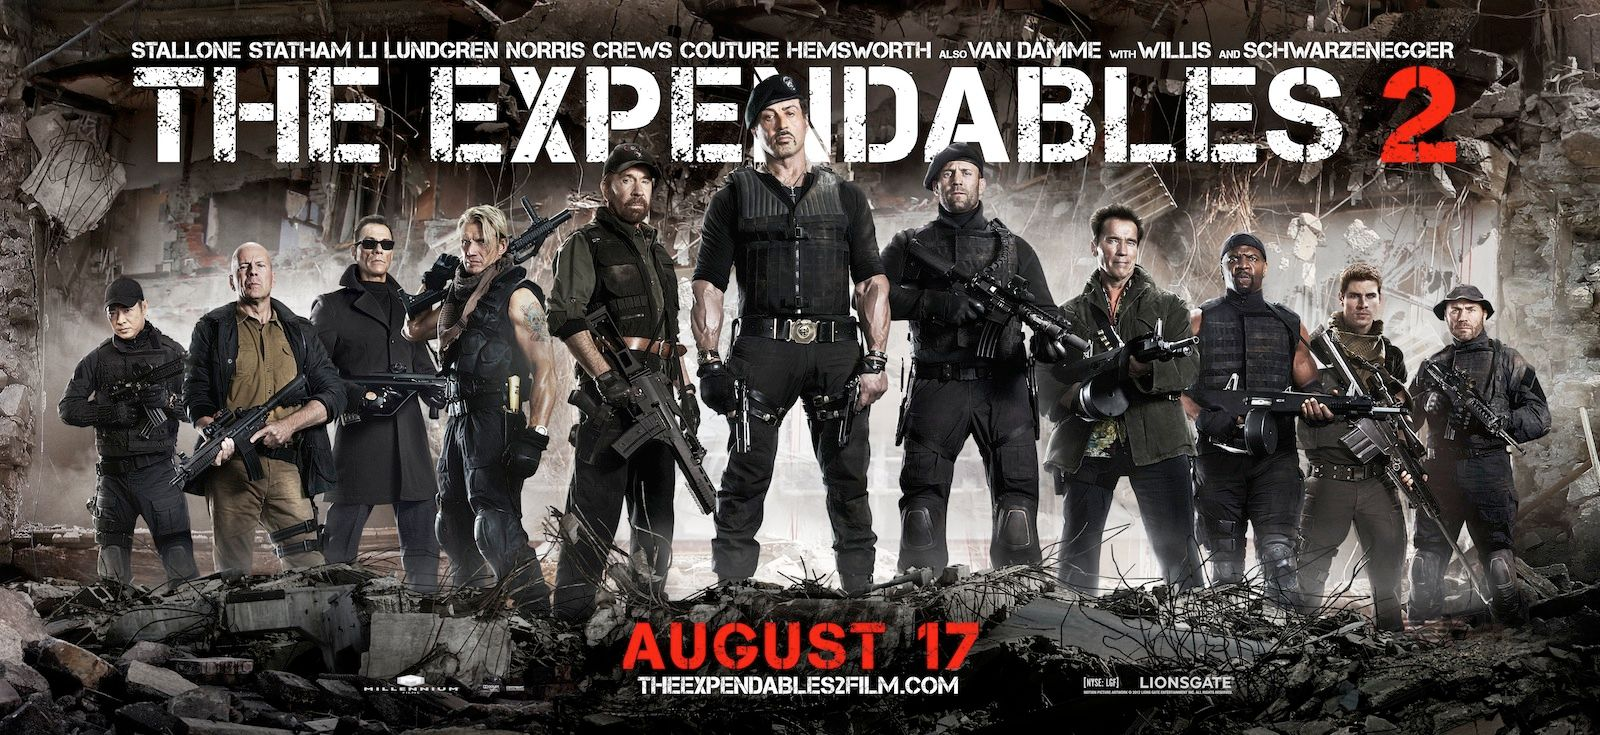 http://cdn.collider.com/wp-content/uploads/the-expendables-2-poster-banner.jpeg